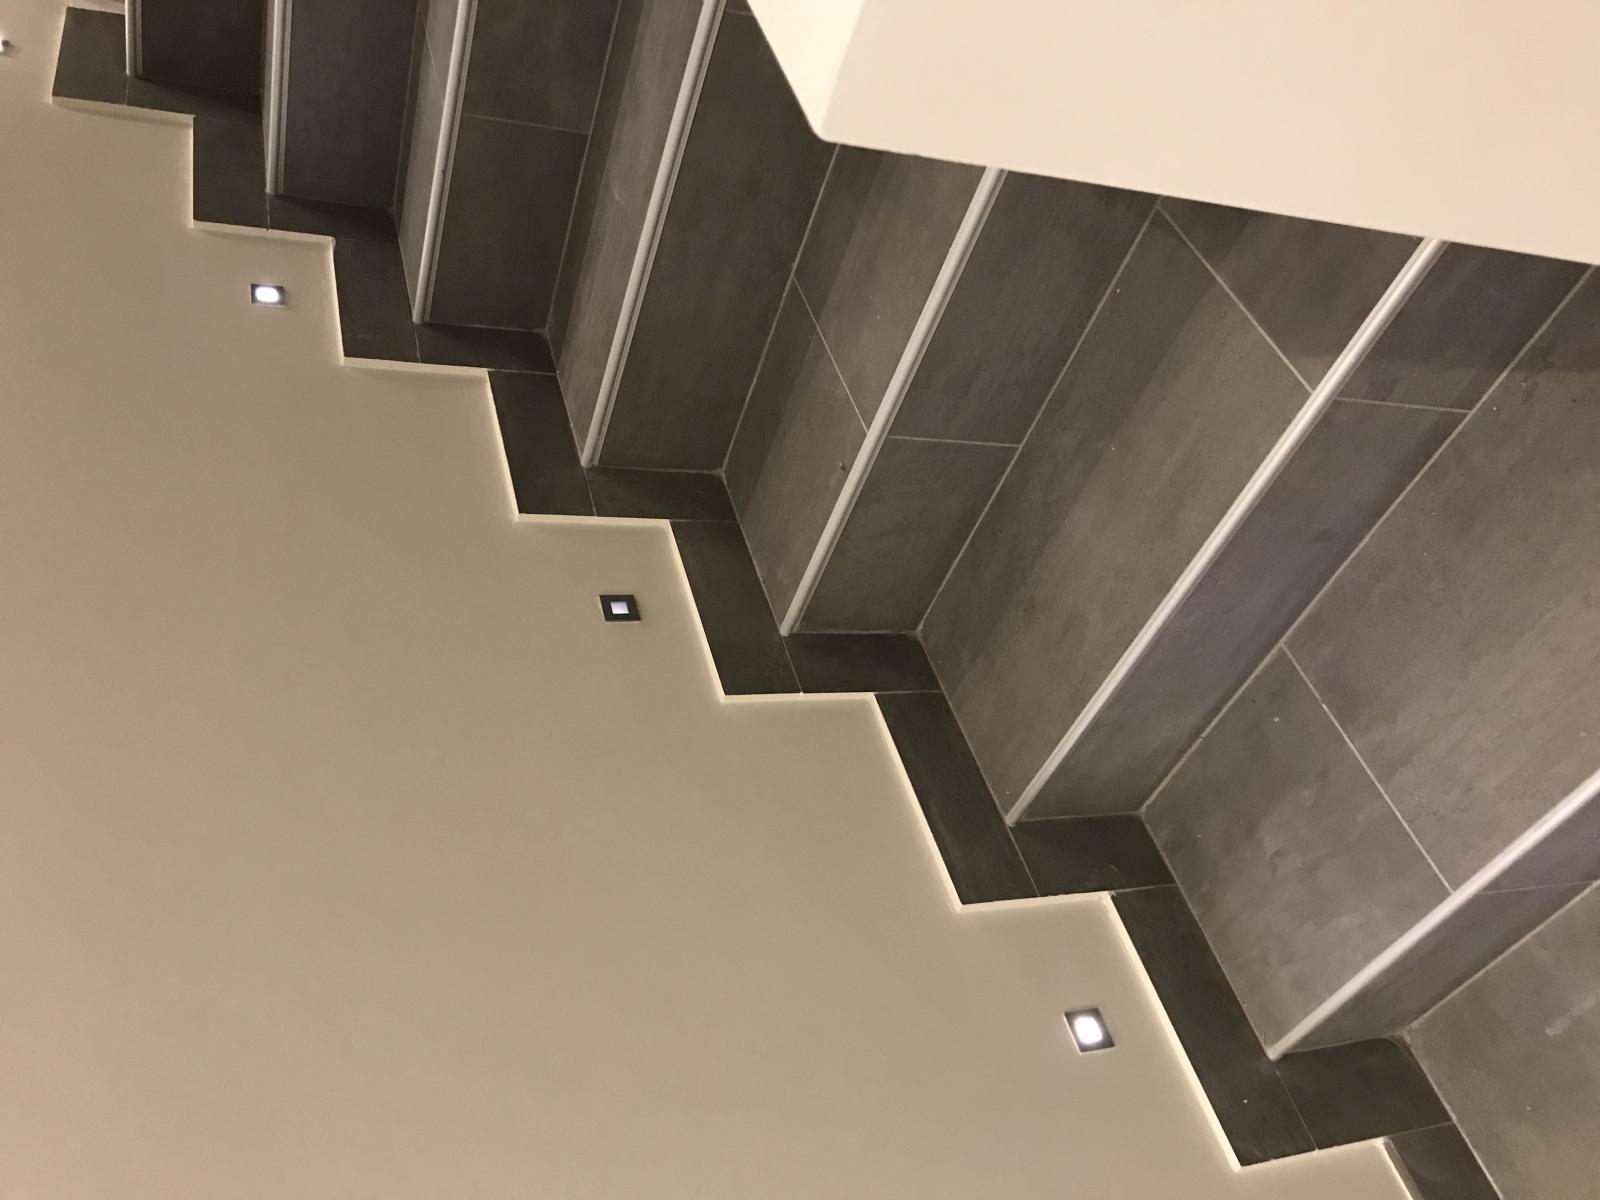 Probleme Mini Spots Escalier